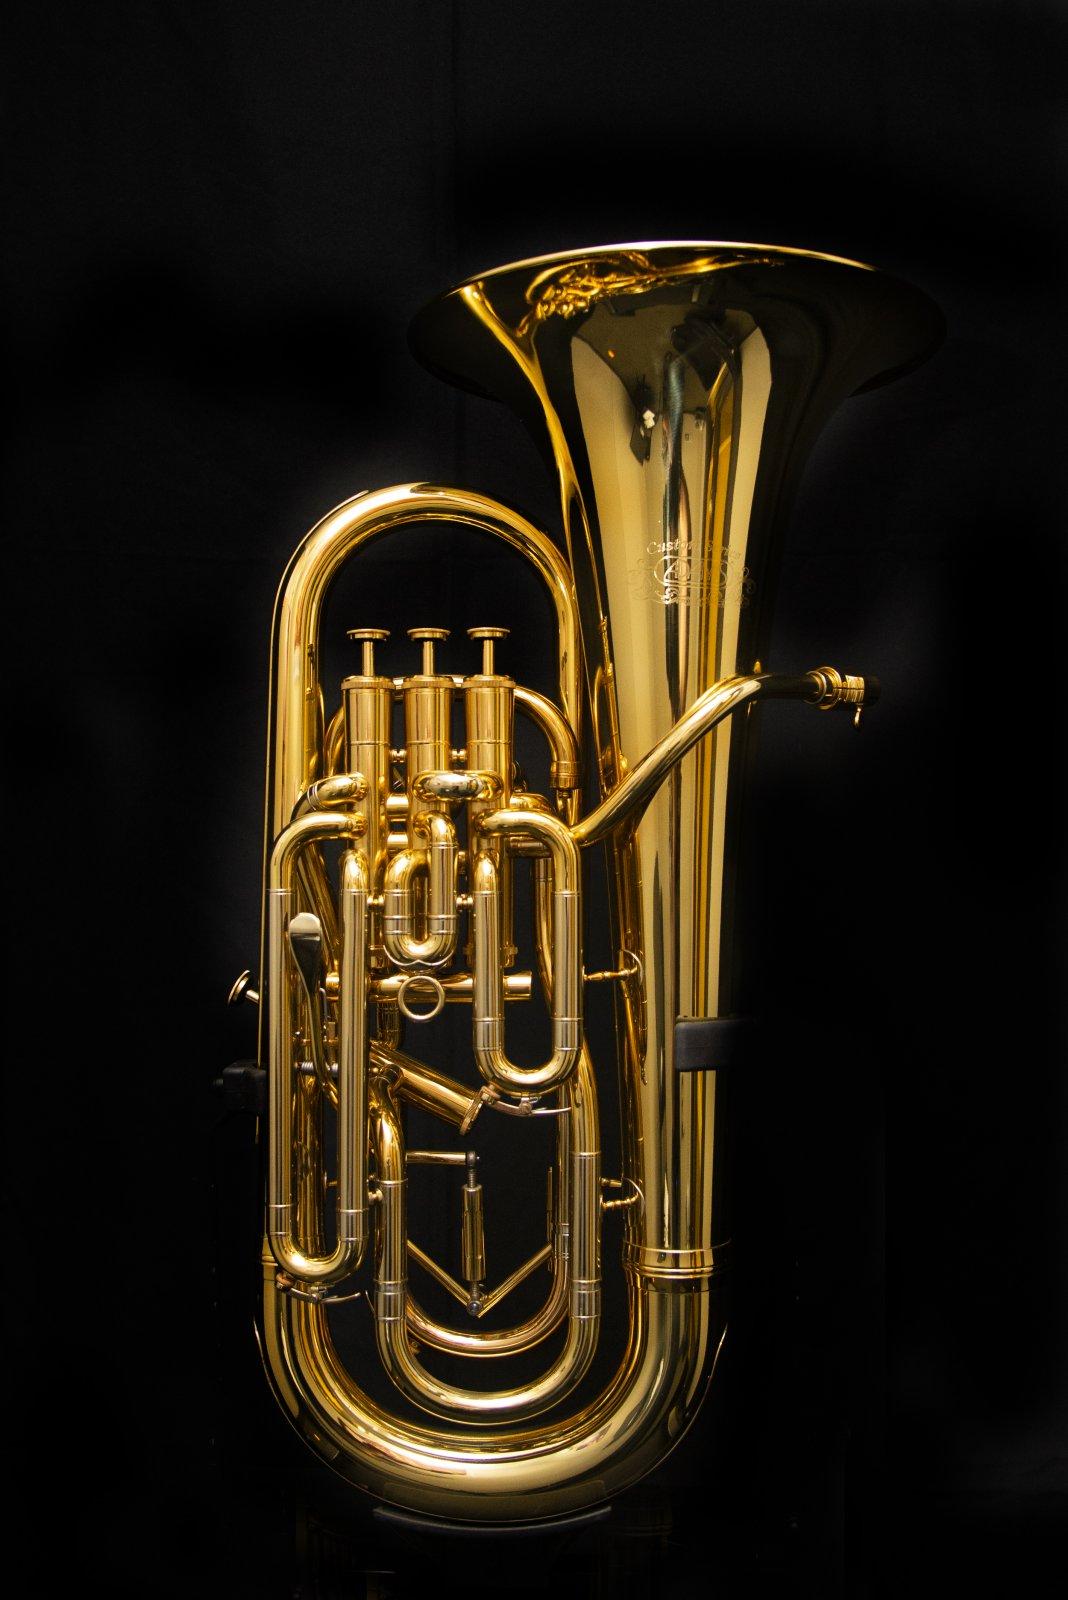 Adams E1 Custom Euphonium, Yellow Brass, Gold Lacquer